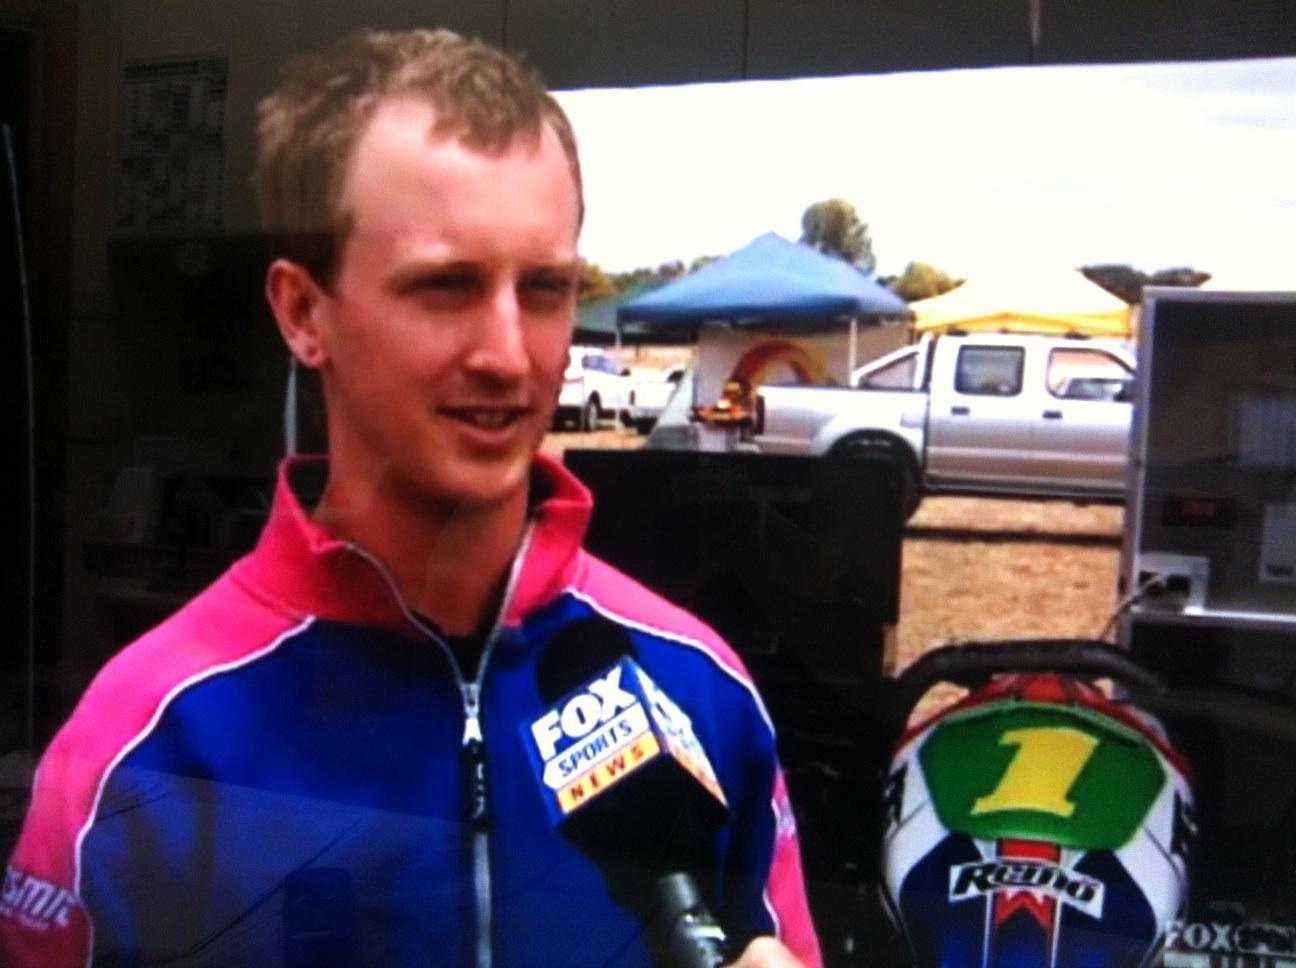 Cian_Fothergill_interview_FoxSports_SA_States2011